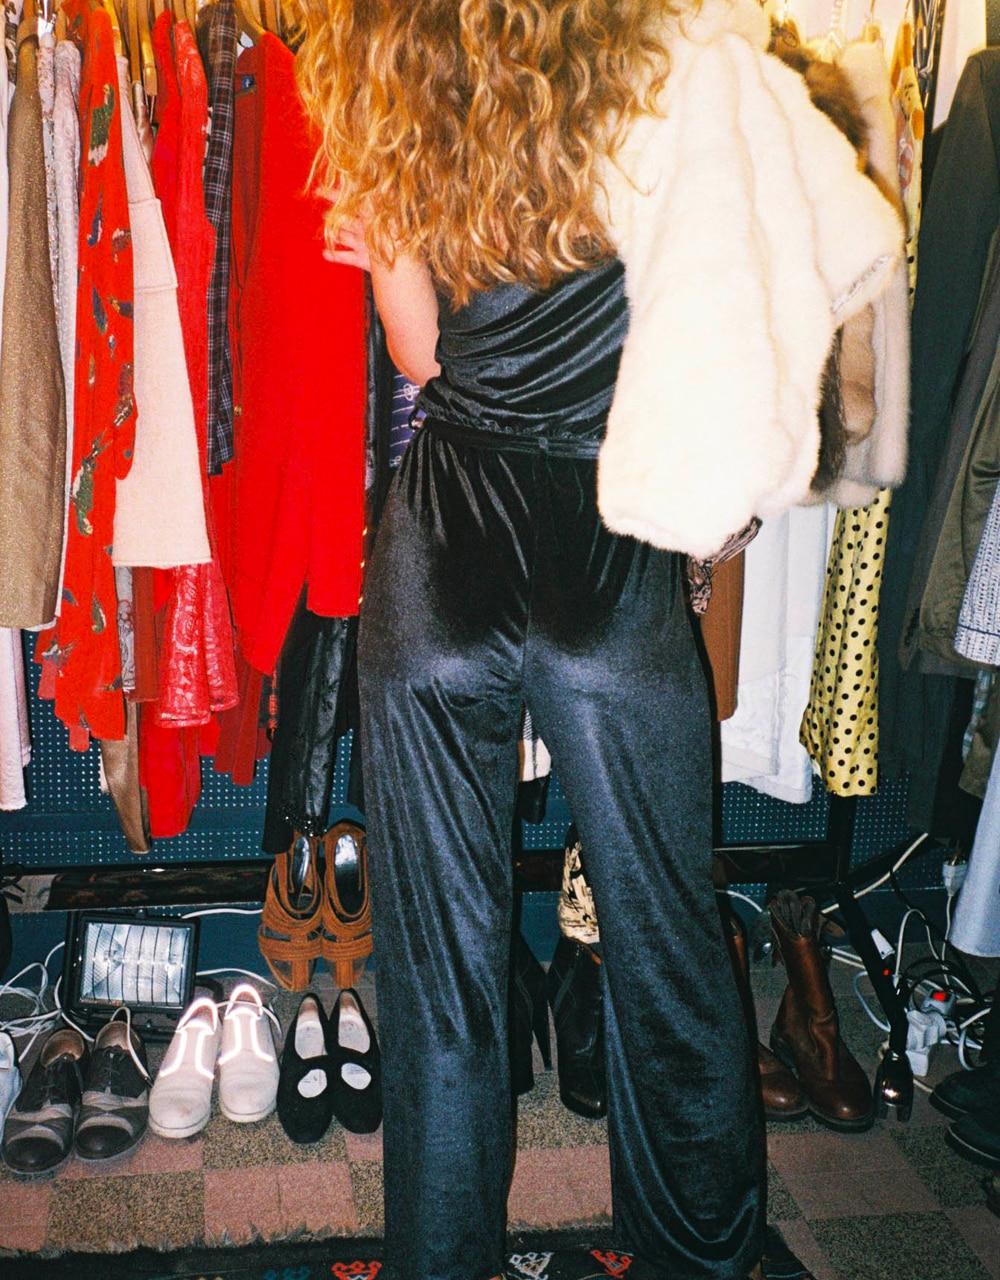 lingerie jumpsuit Charlie velvet Black Storm 59 € Girls In Paris photo 5